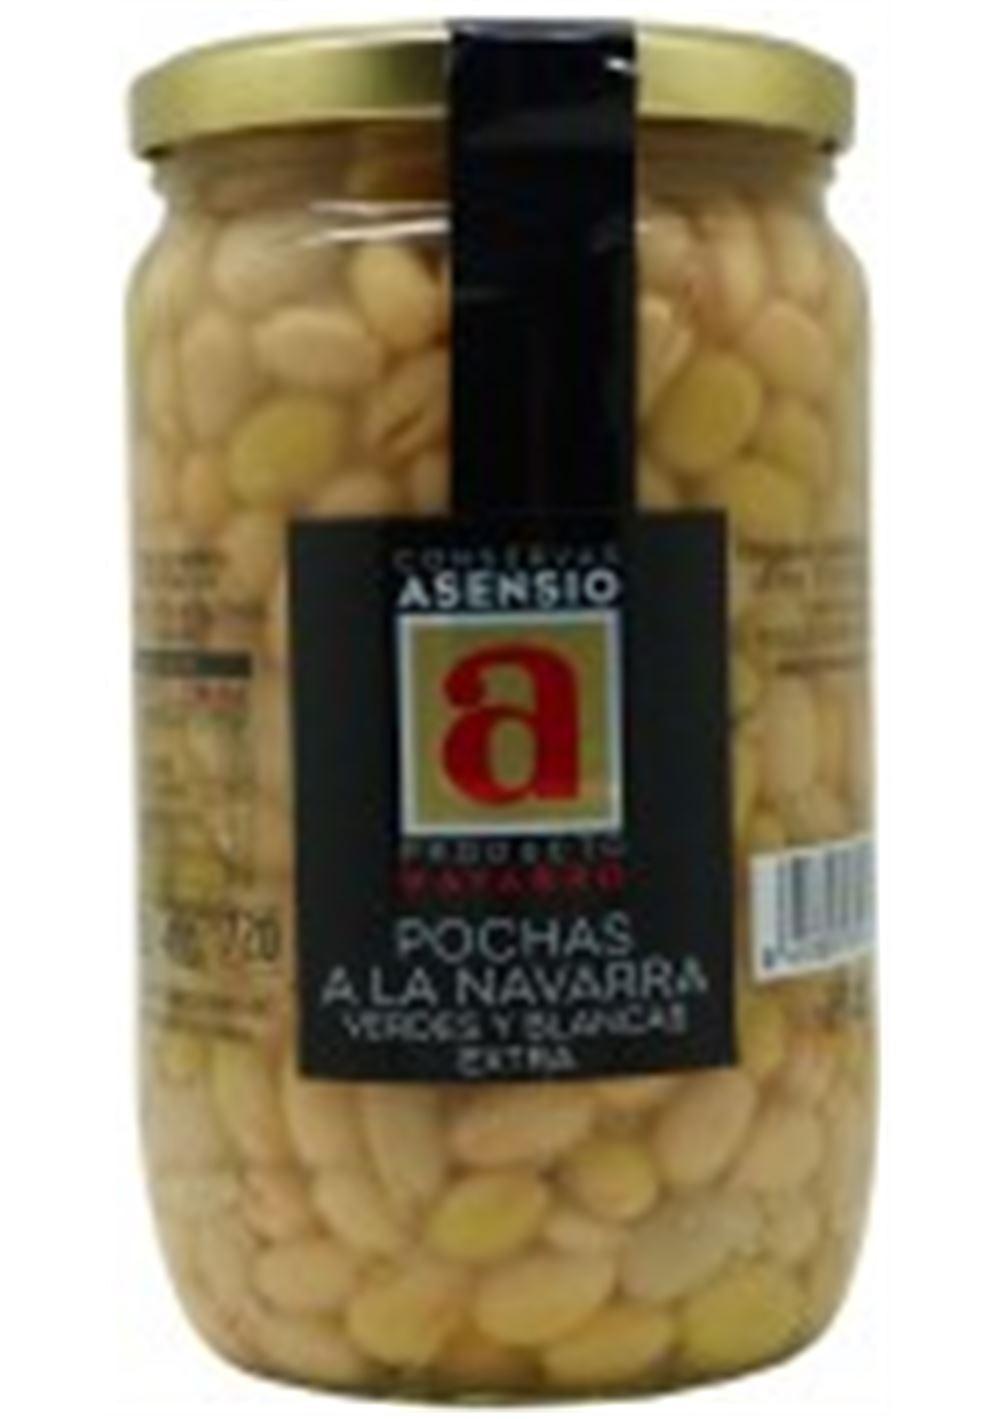 POCHAS ASENSIO600